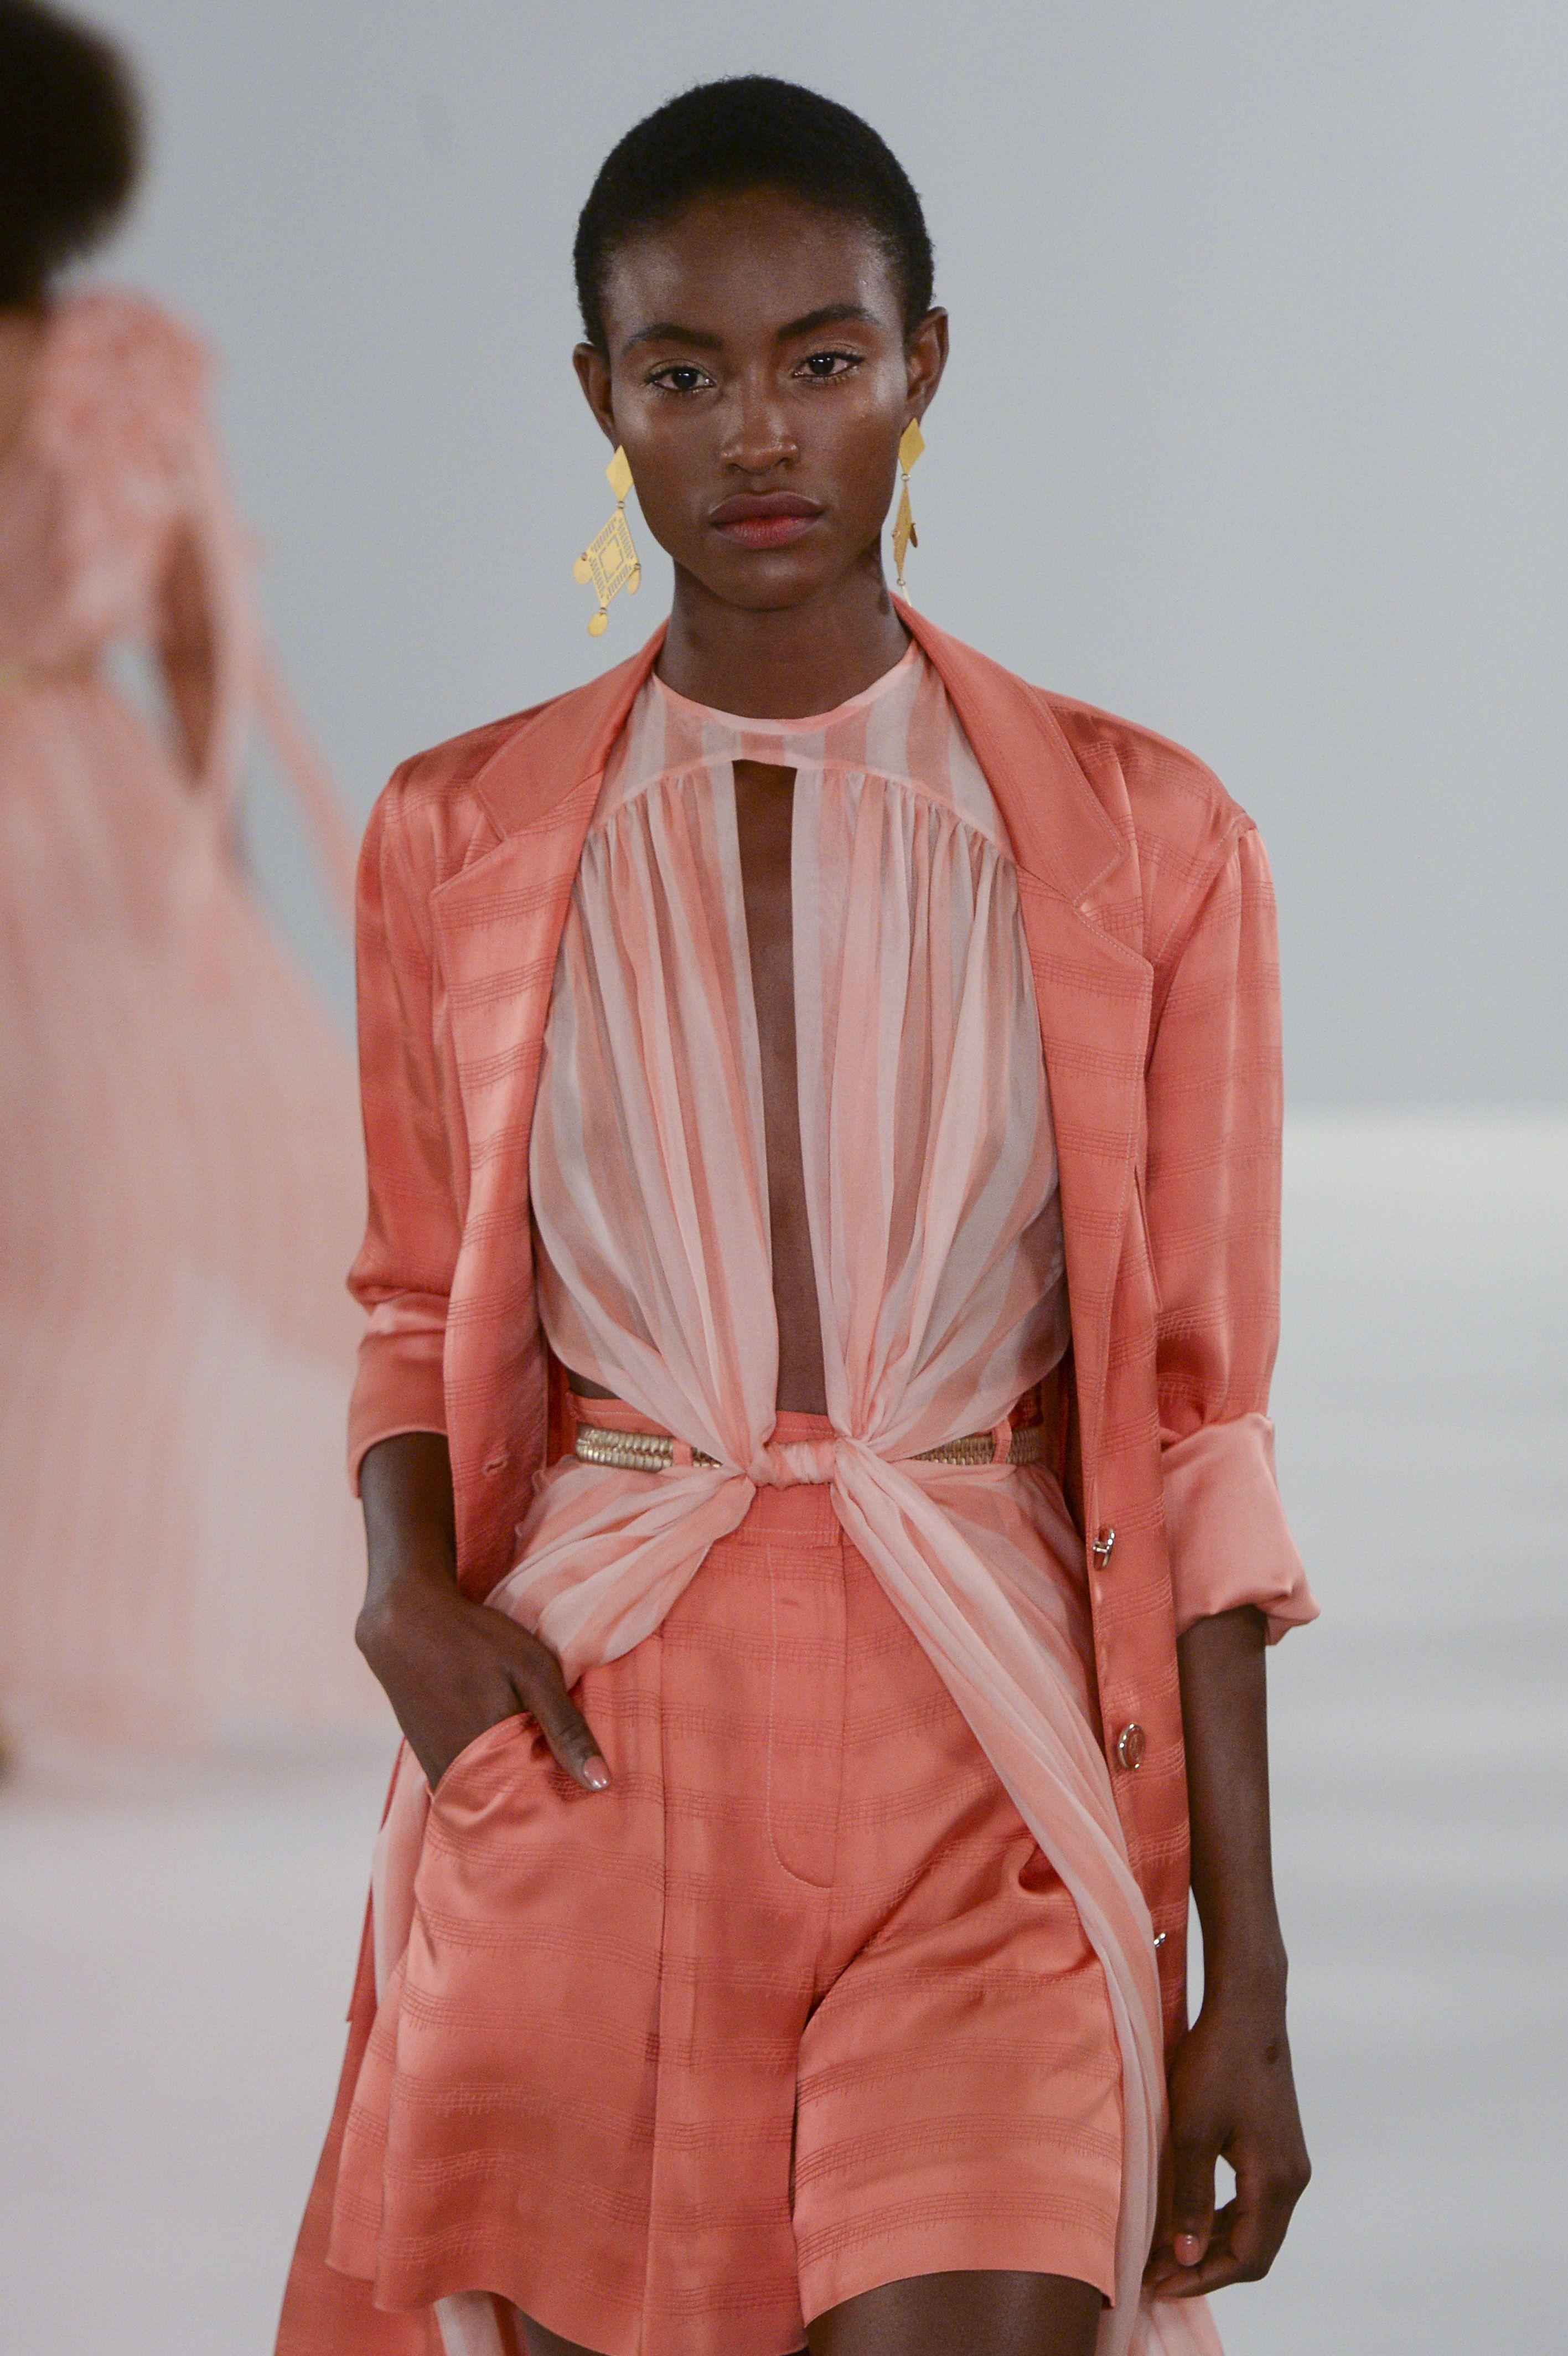 Model on the catwalk Temperley London show, Runway, Spring Summer 2019, London Fashion Week, UK – 15 Sep 2018